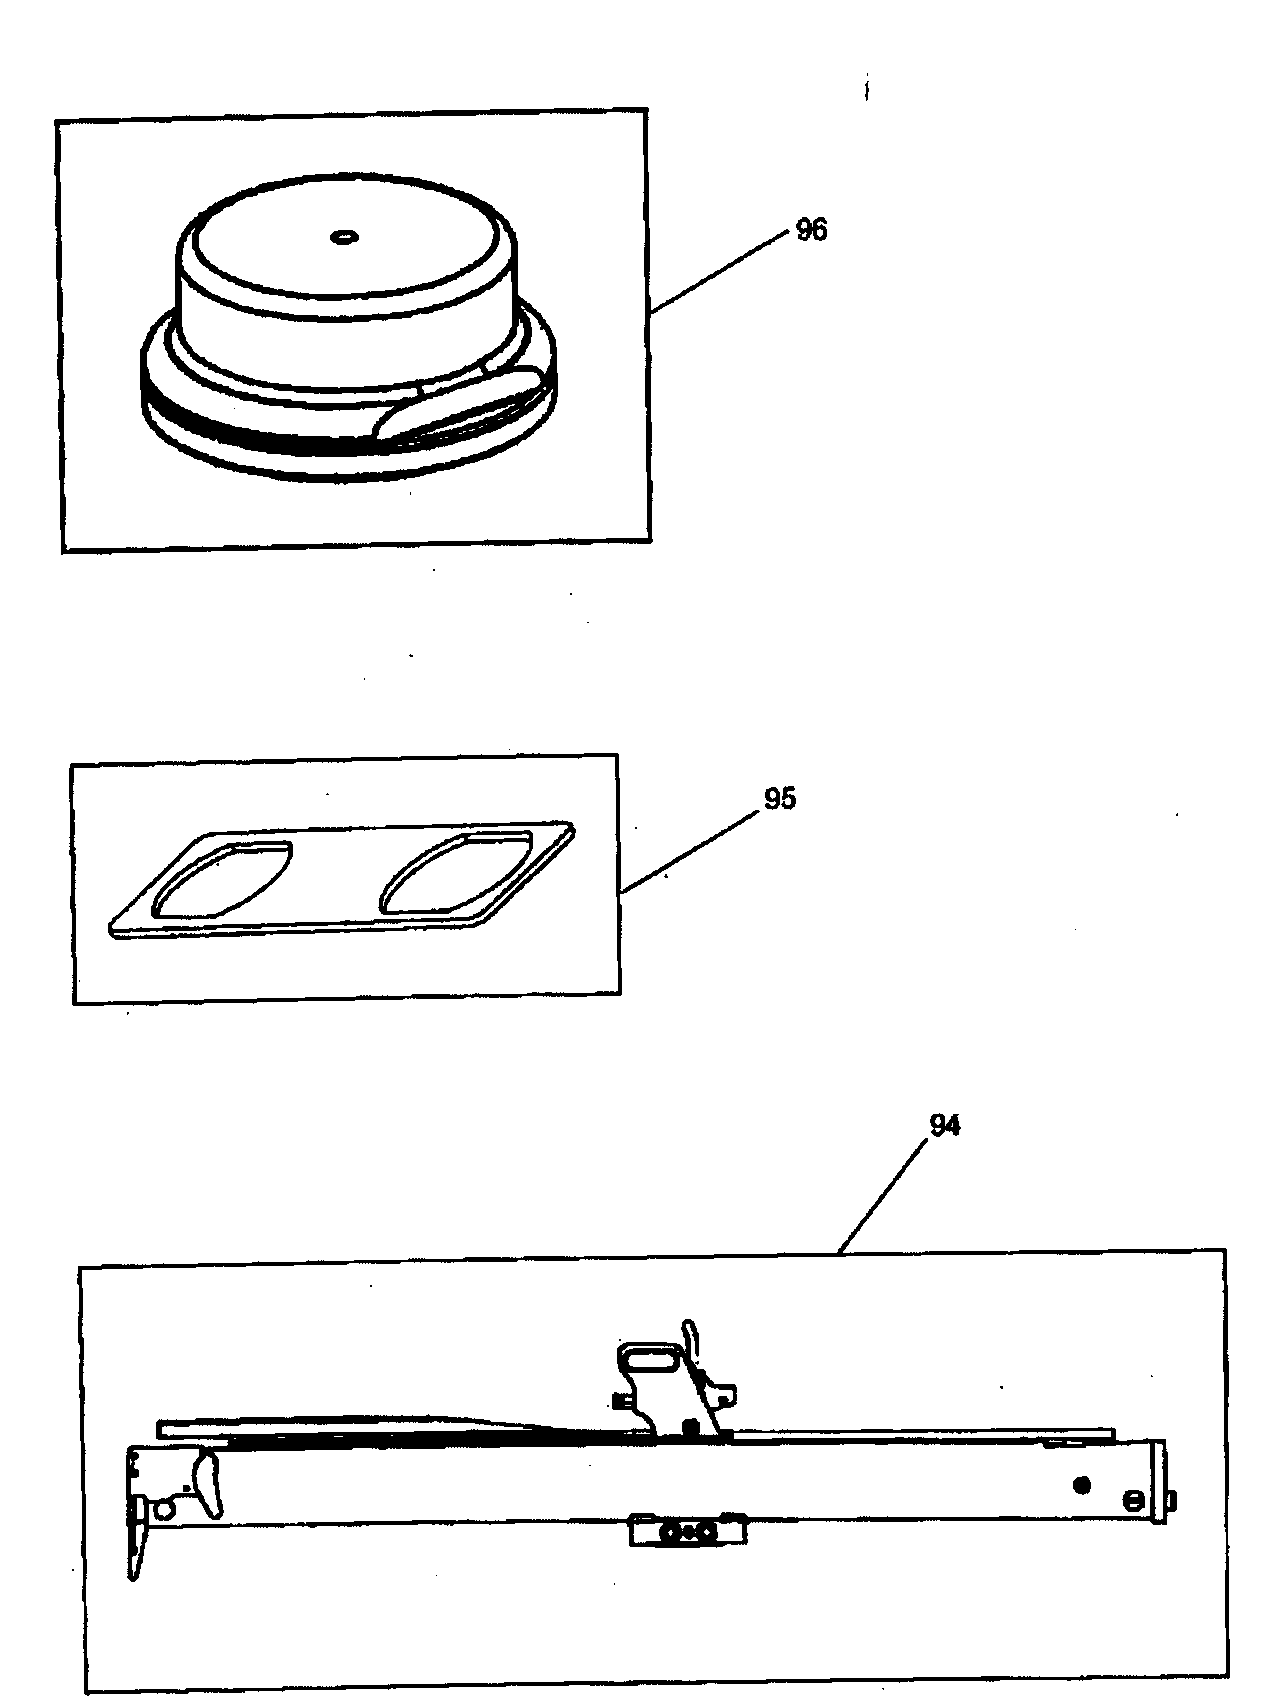 Stanley-Bostitch model 438S2R stapler genuine parts